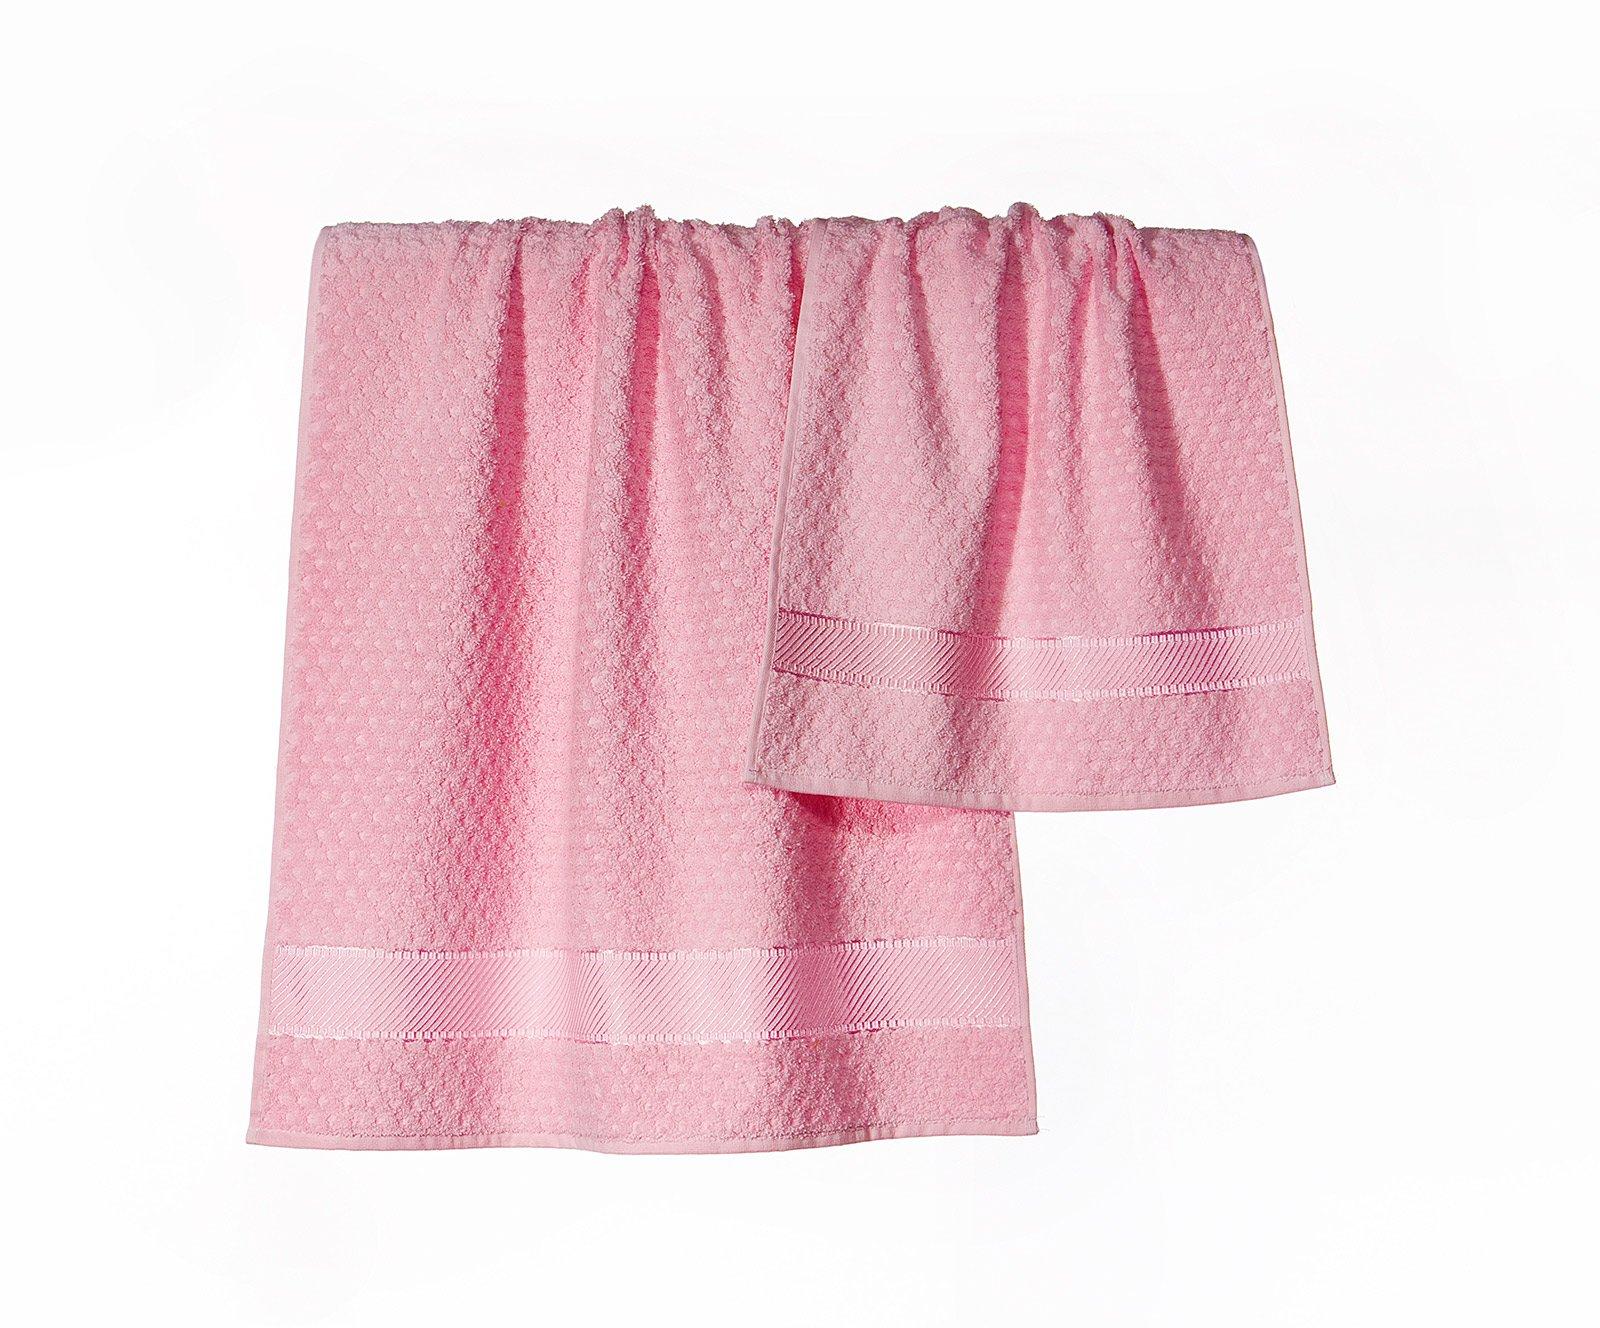 Spugne Da Bagno Caleffi : Asciugamani e spugne per il bagno cose di casa